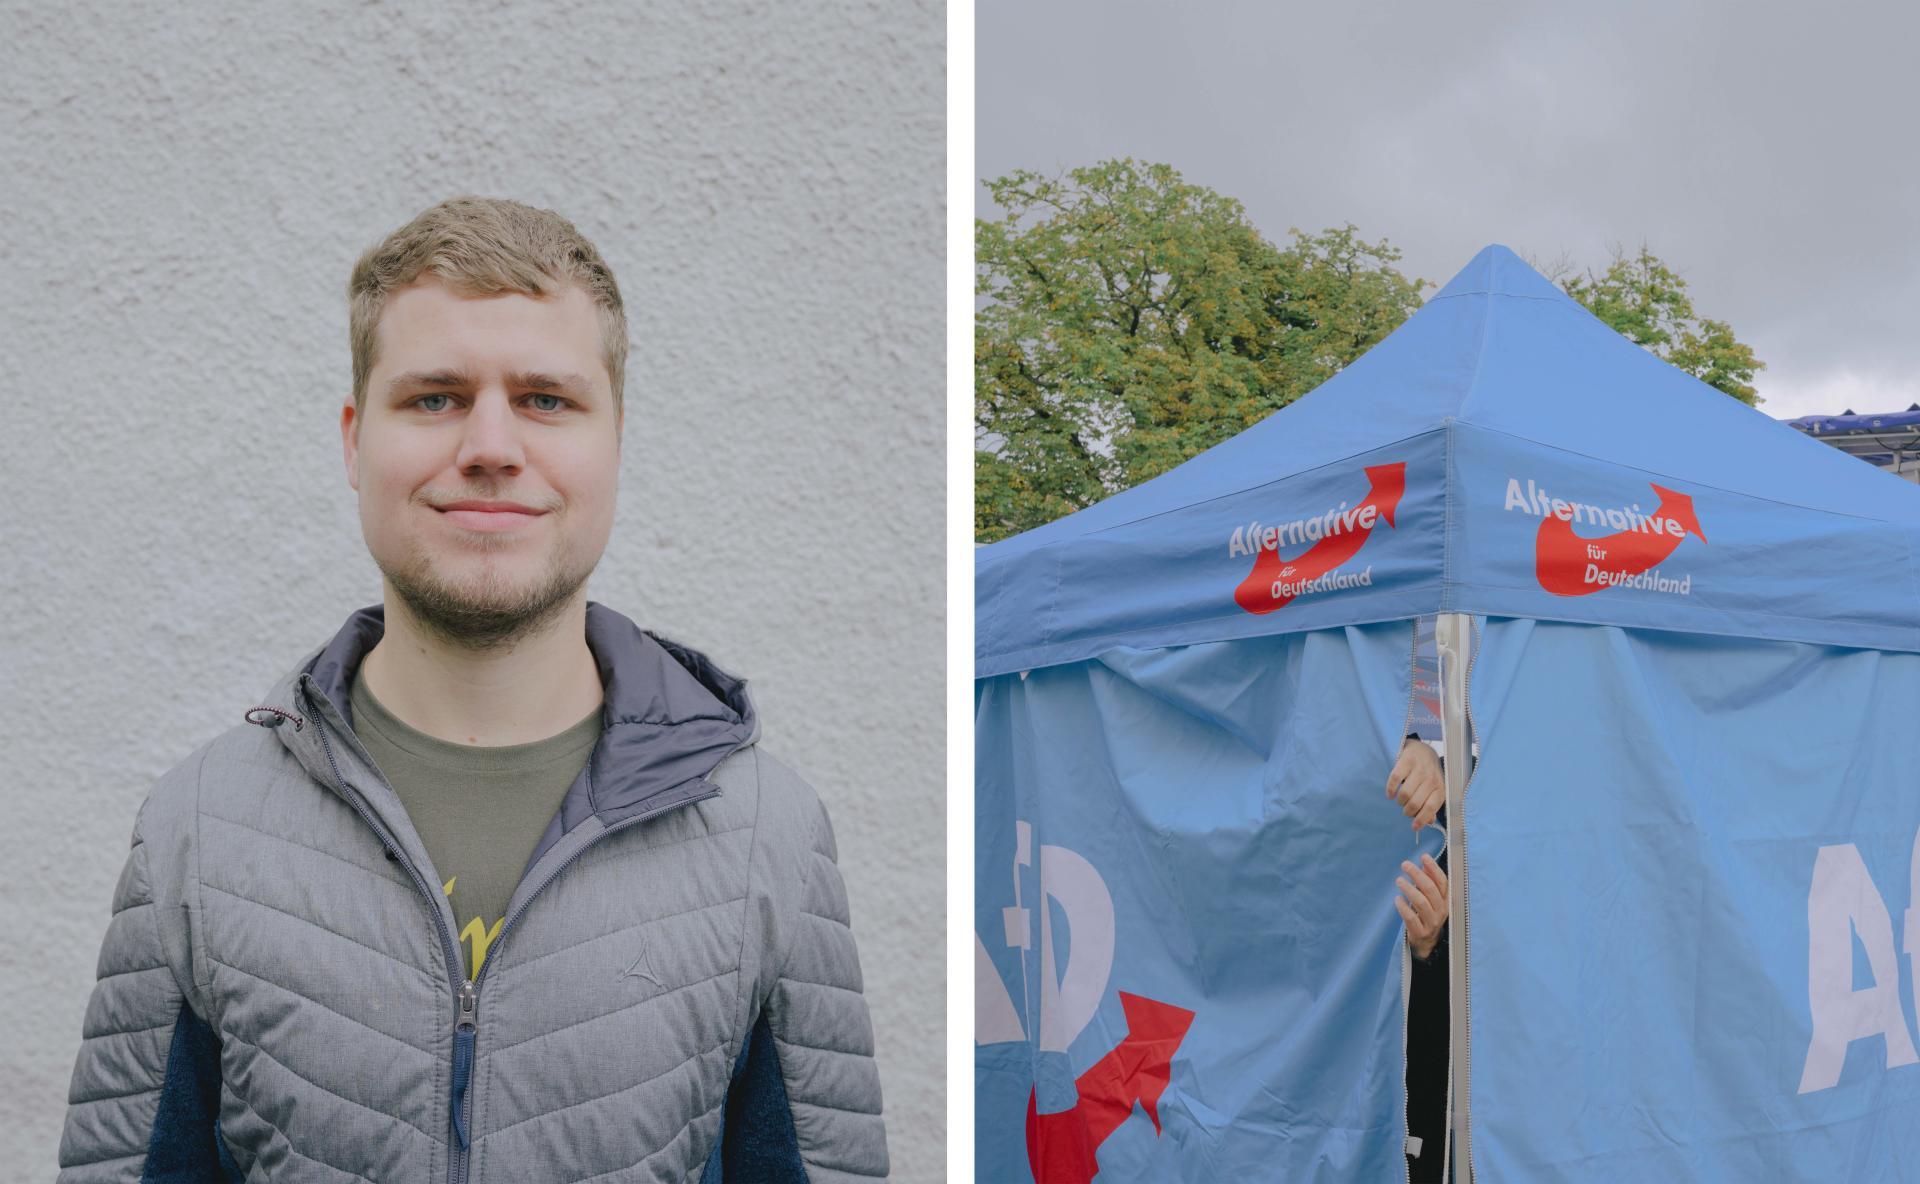 Allemange militant AfD-goerlitz4